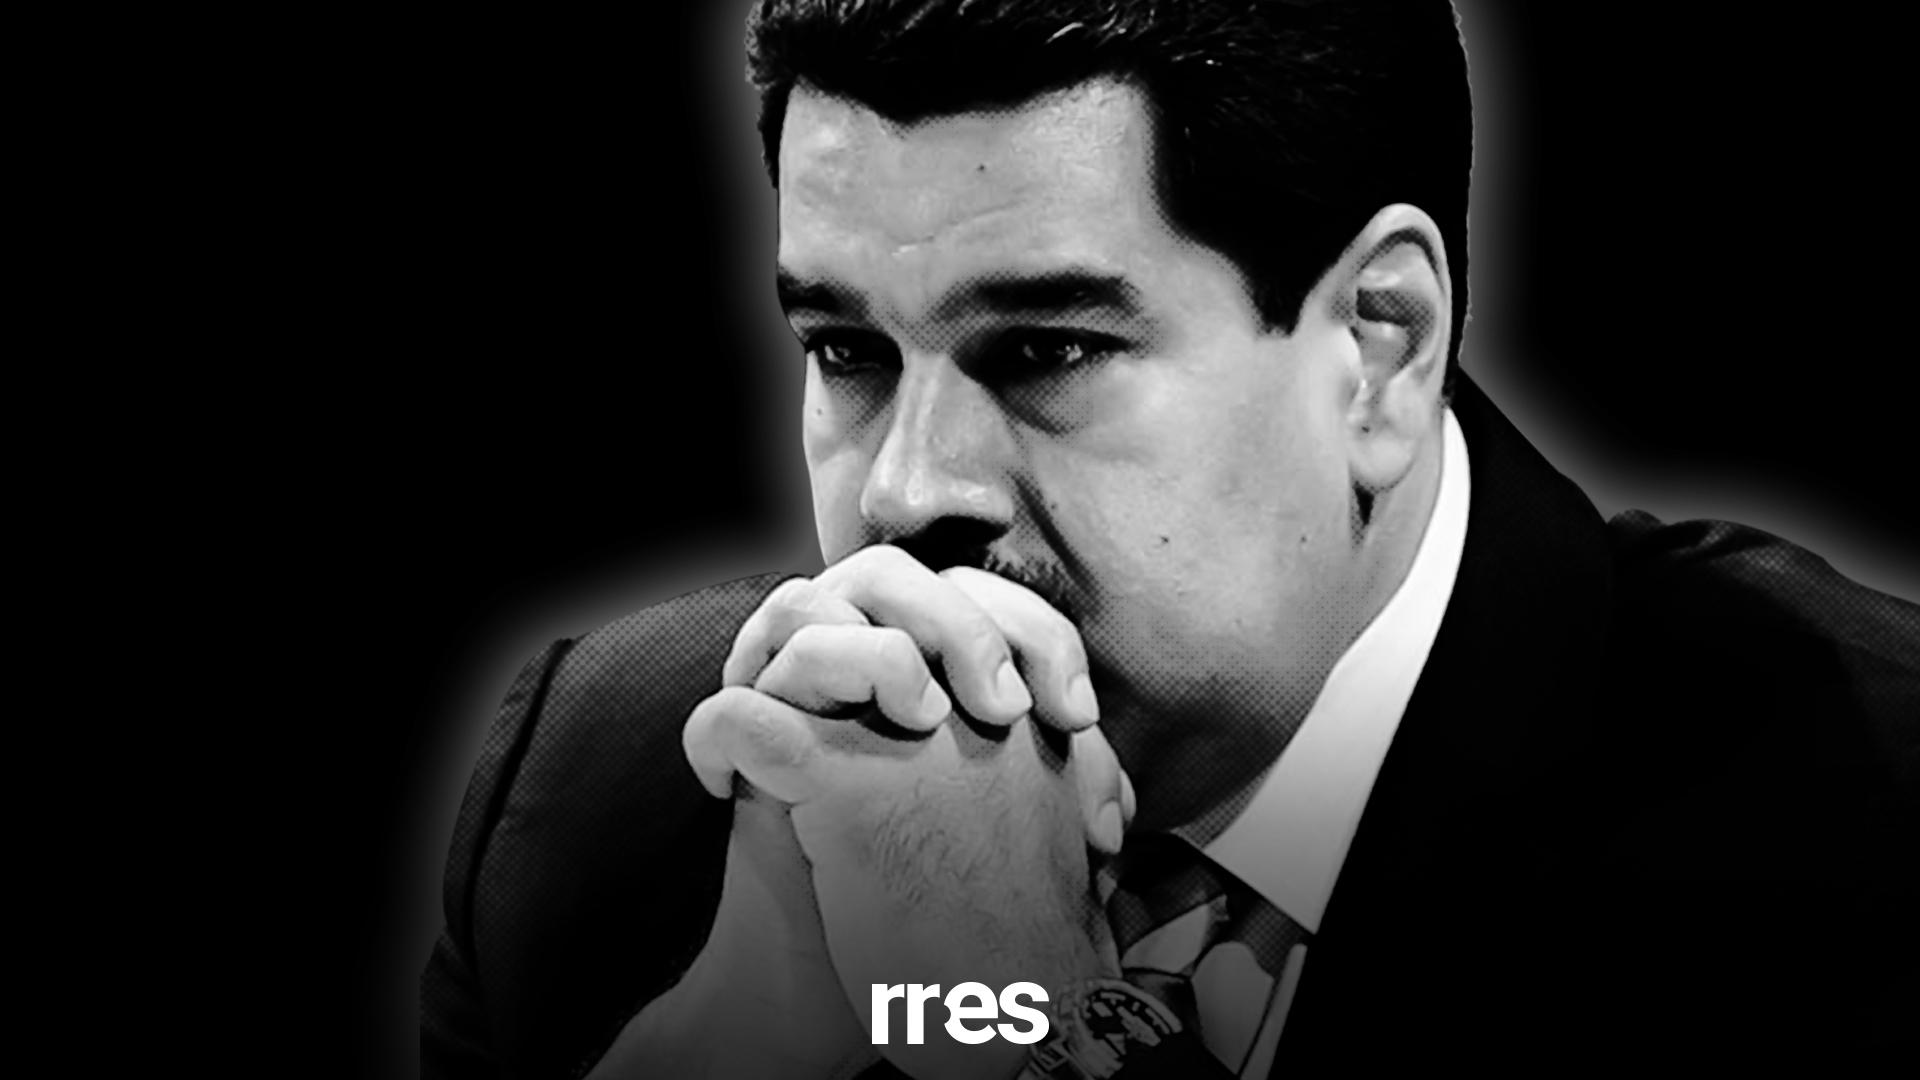 10 momentos que dejaron a Maduro pasando pena este 2020